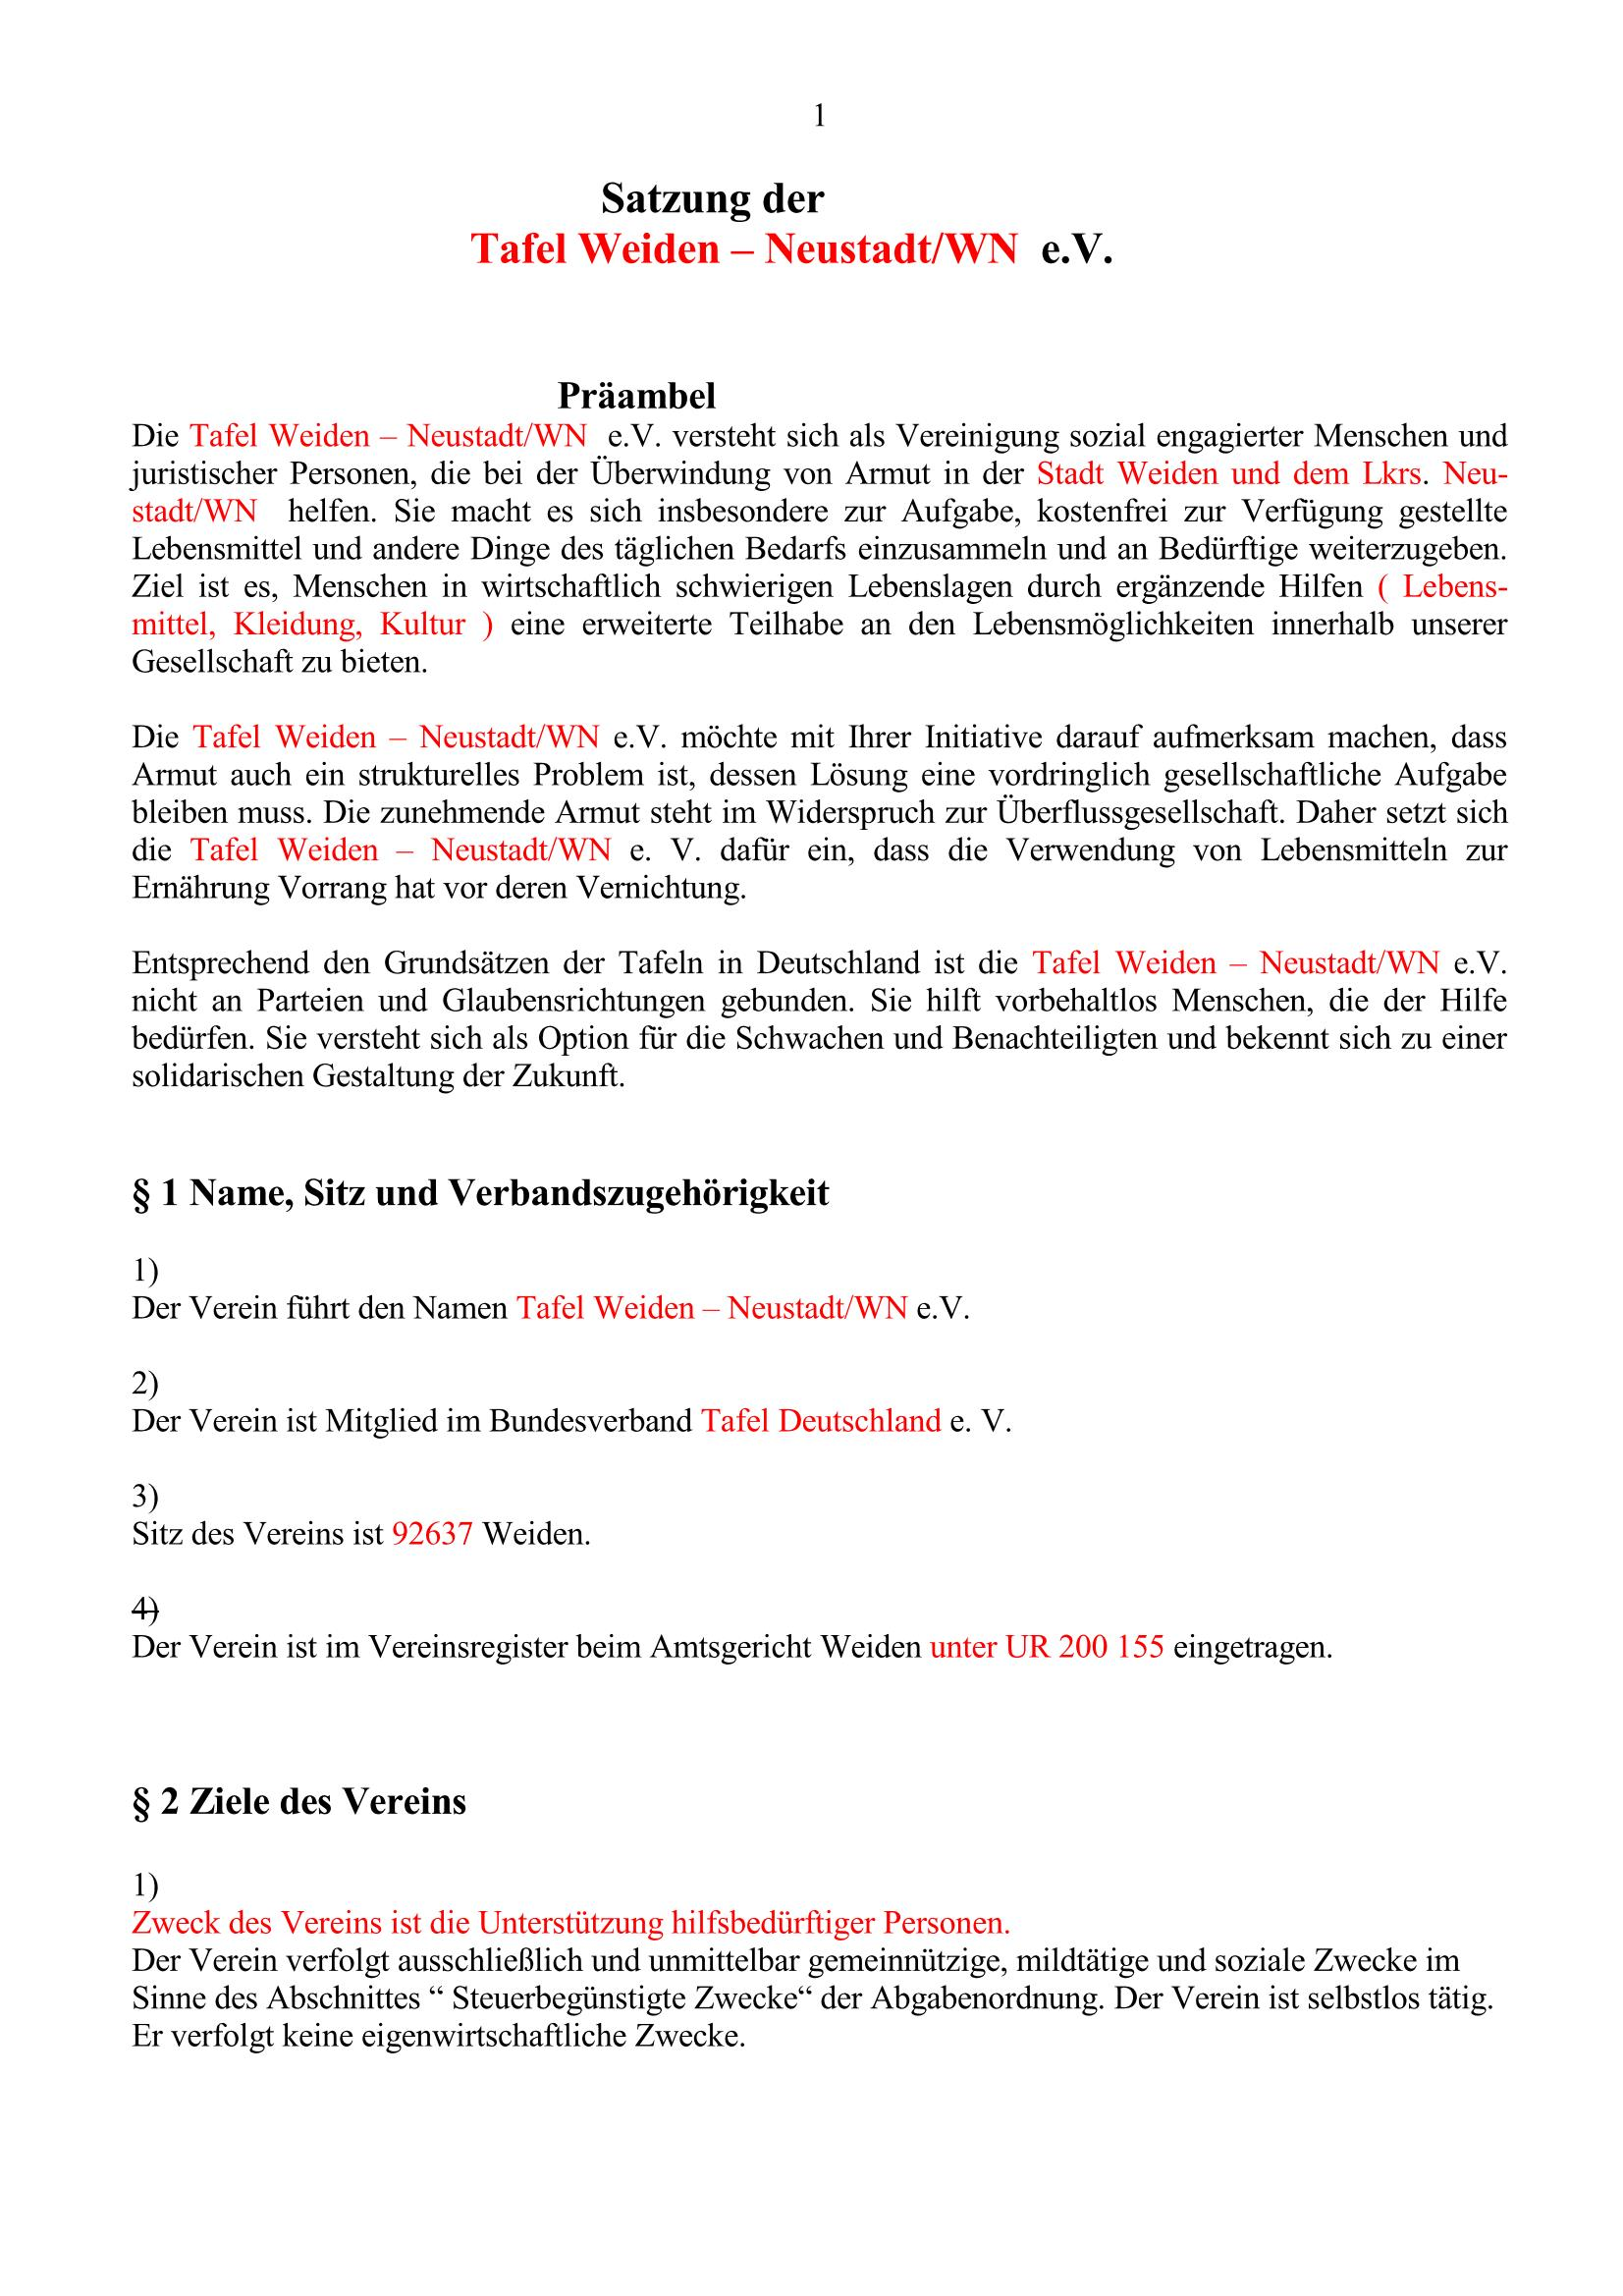 Satzung 2017. S.1